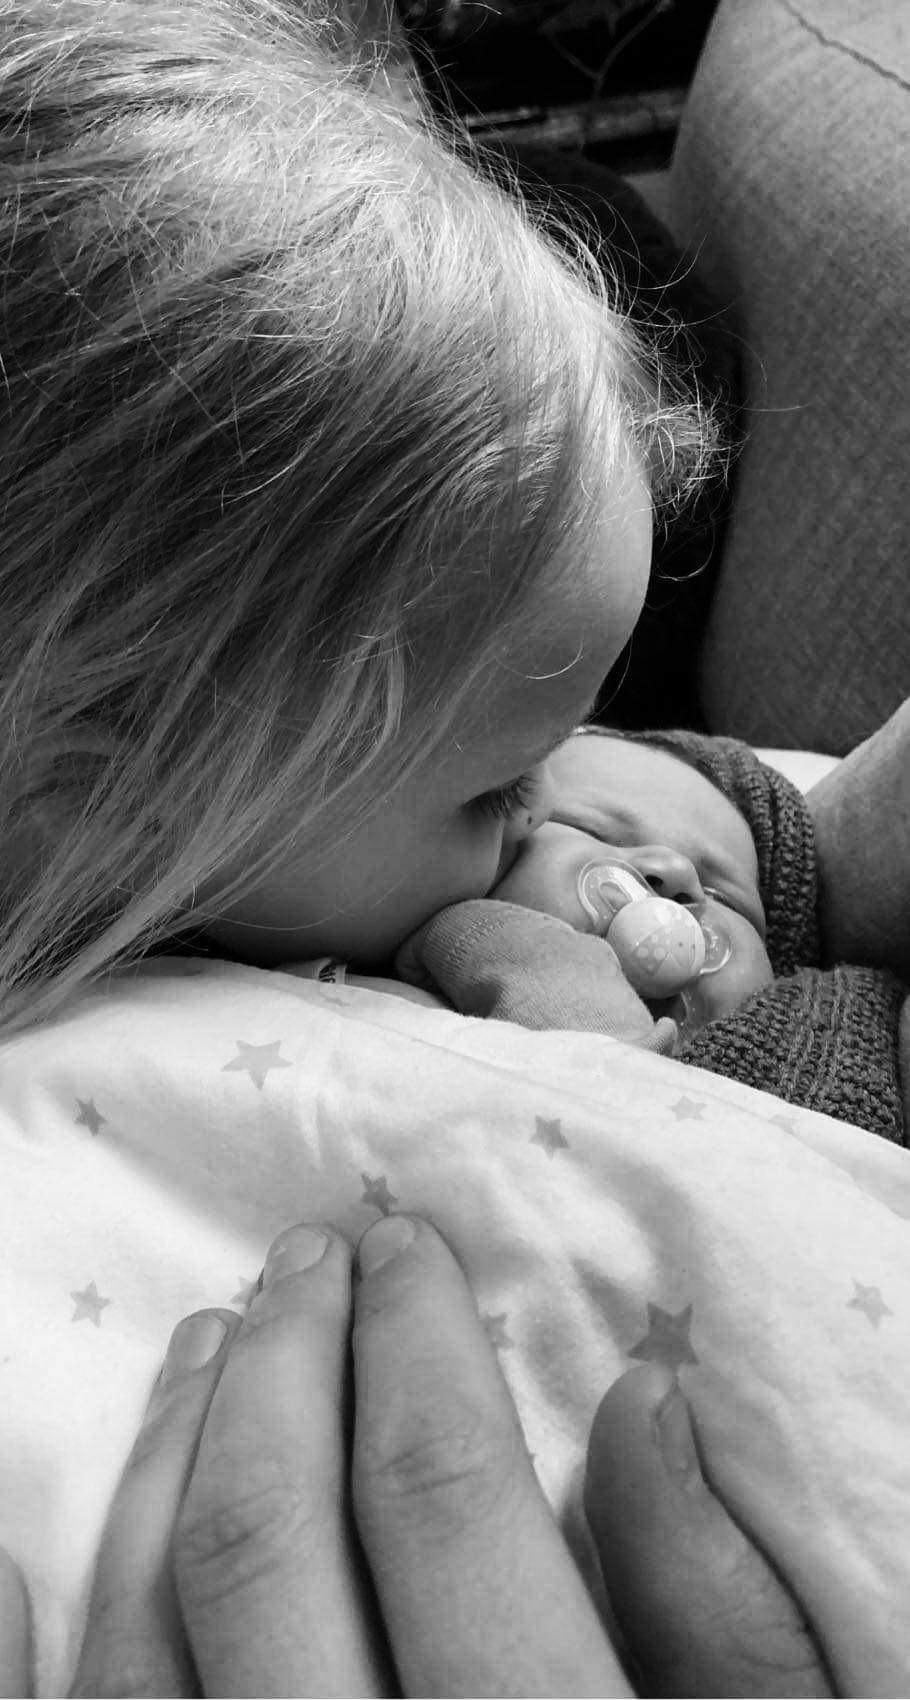 Carolines andre fødsel ble en positiv fødsel